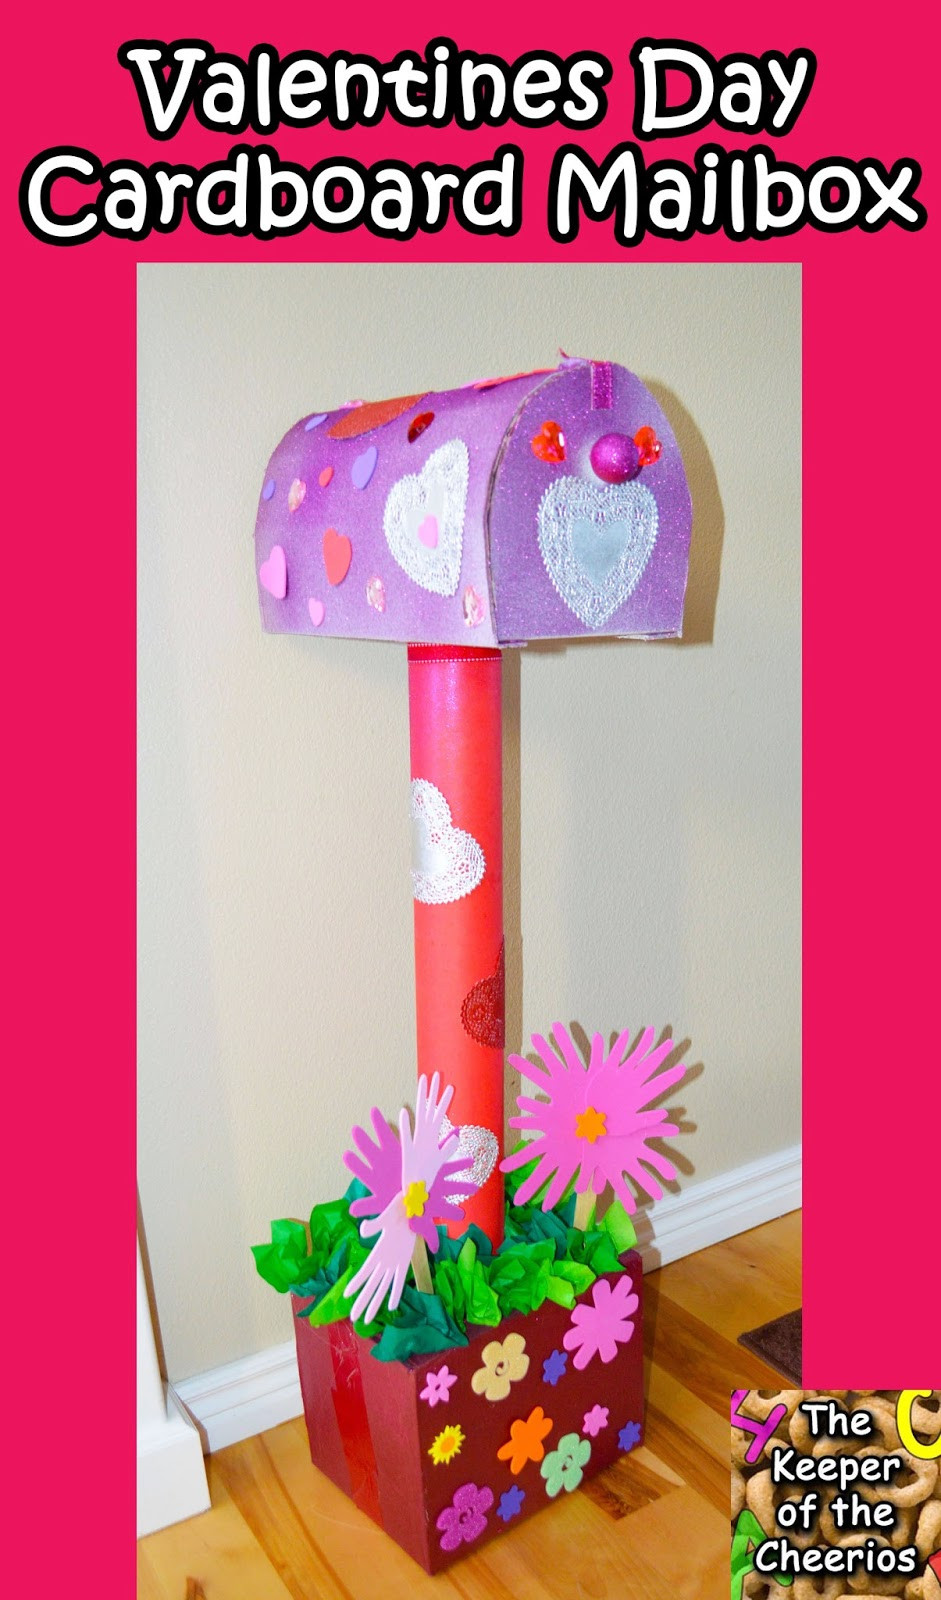 Best ideas about DIY Valentine Mailbox . Save or Pin Valentines Day Cardboard Mailbox DIY Now.